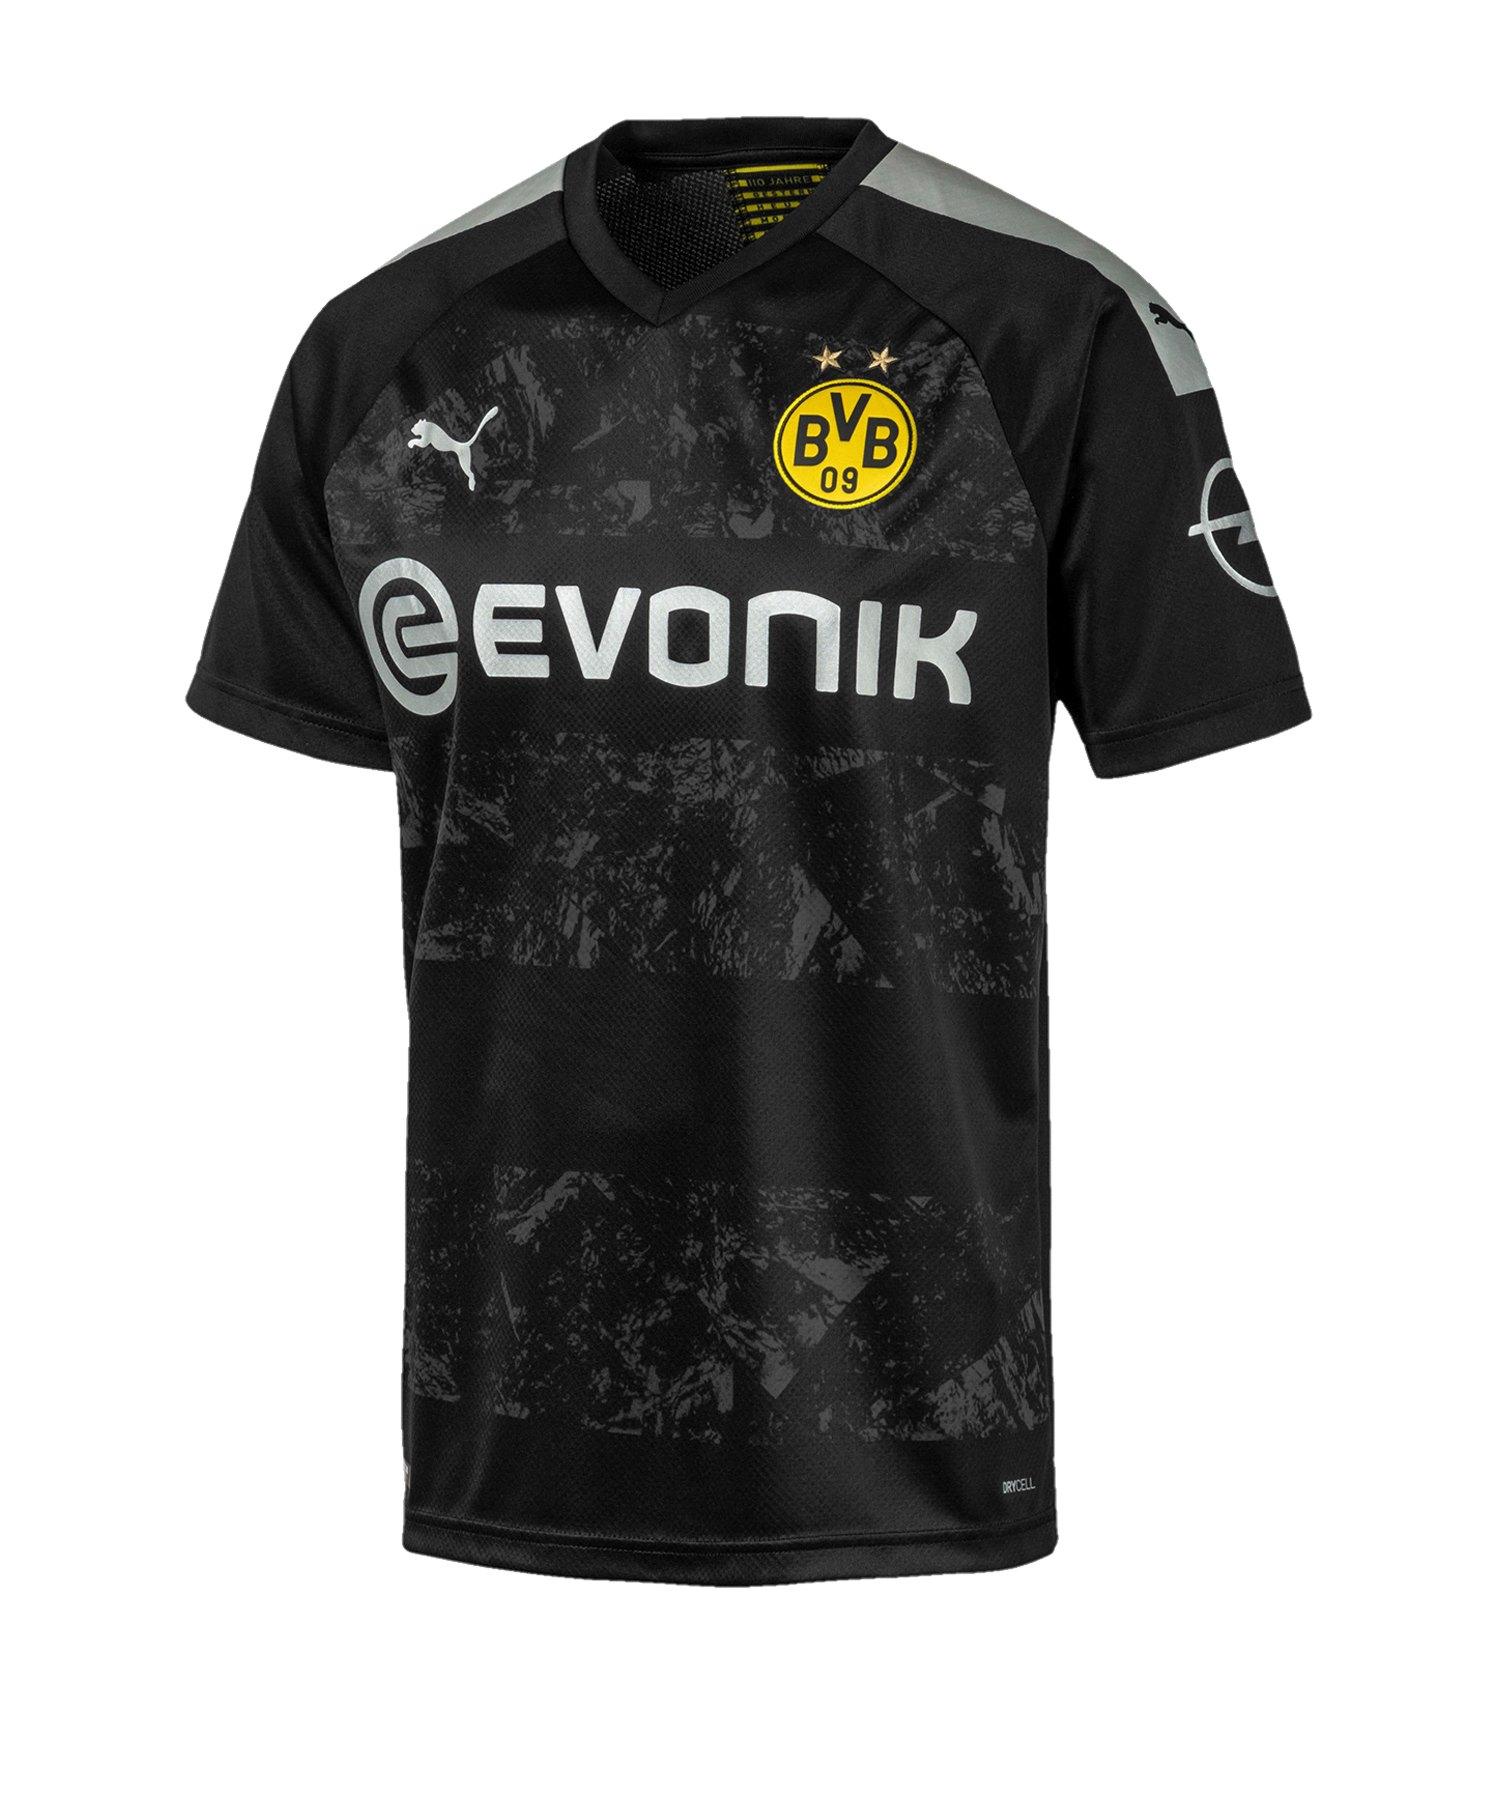 PUMA BVB Dortmund Trikot Away 2019/2020 F12 - Schwarz